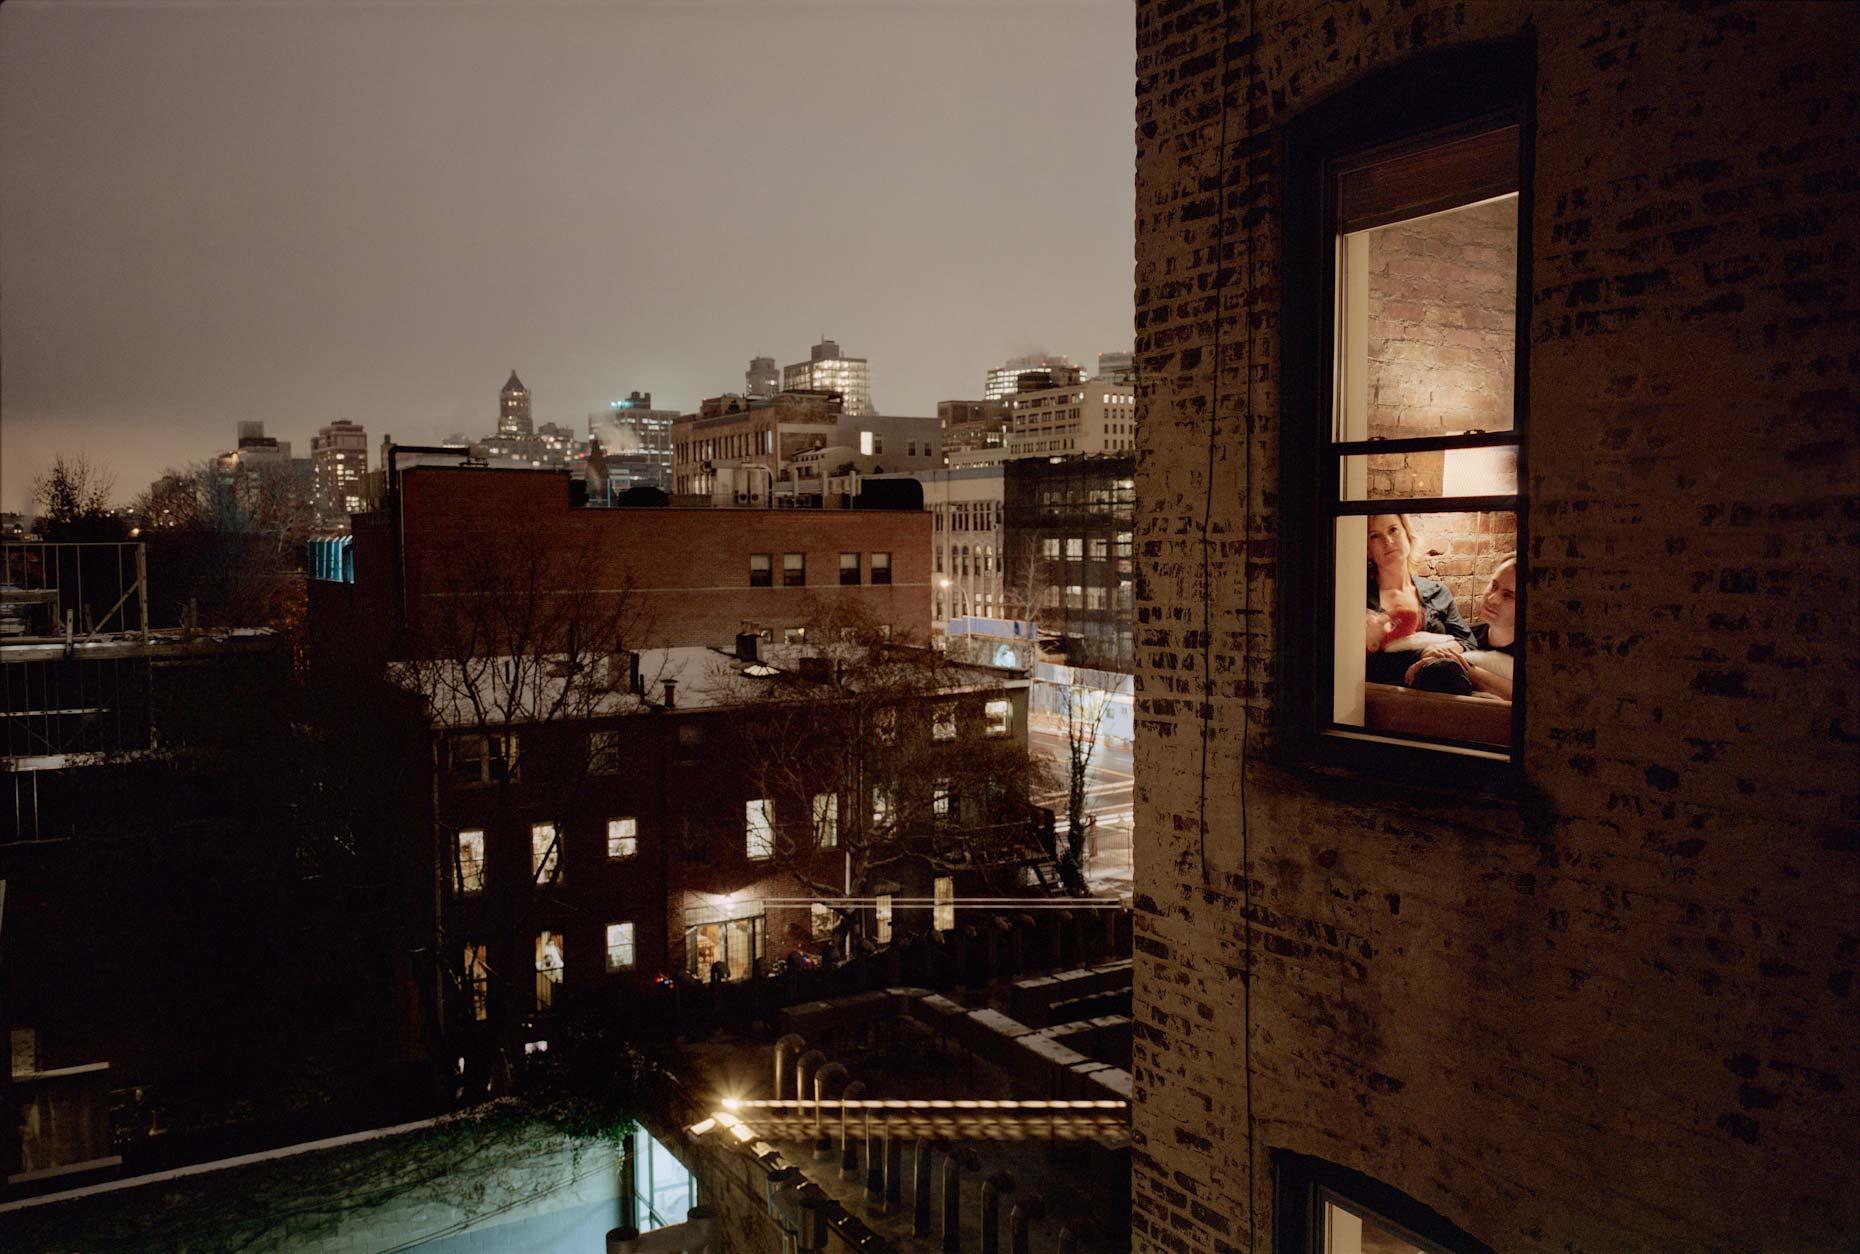 out-my-window-by-gail-albert-halaban-gessato-1